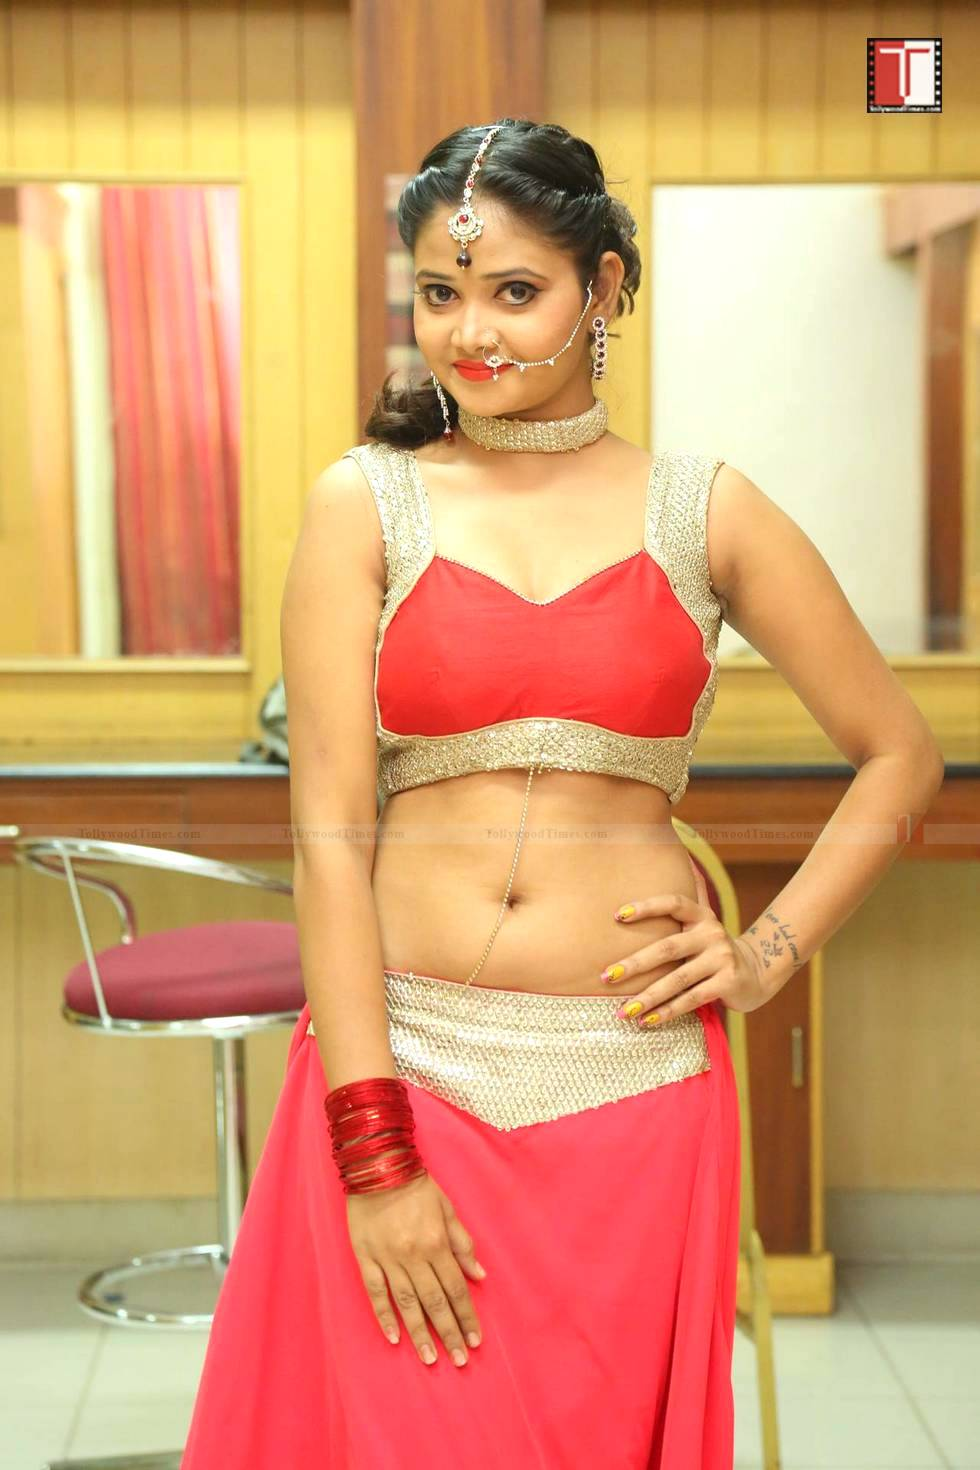 shriya vyas at rakshasudu movie audio launch tollywoodtimes